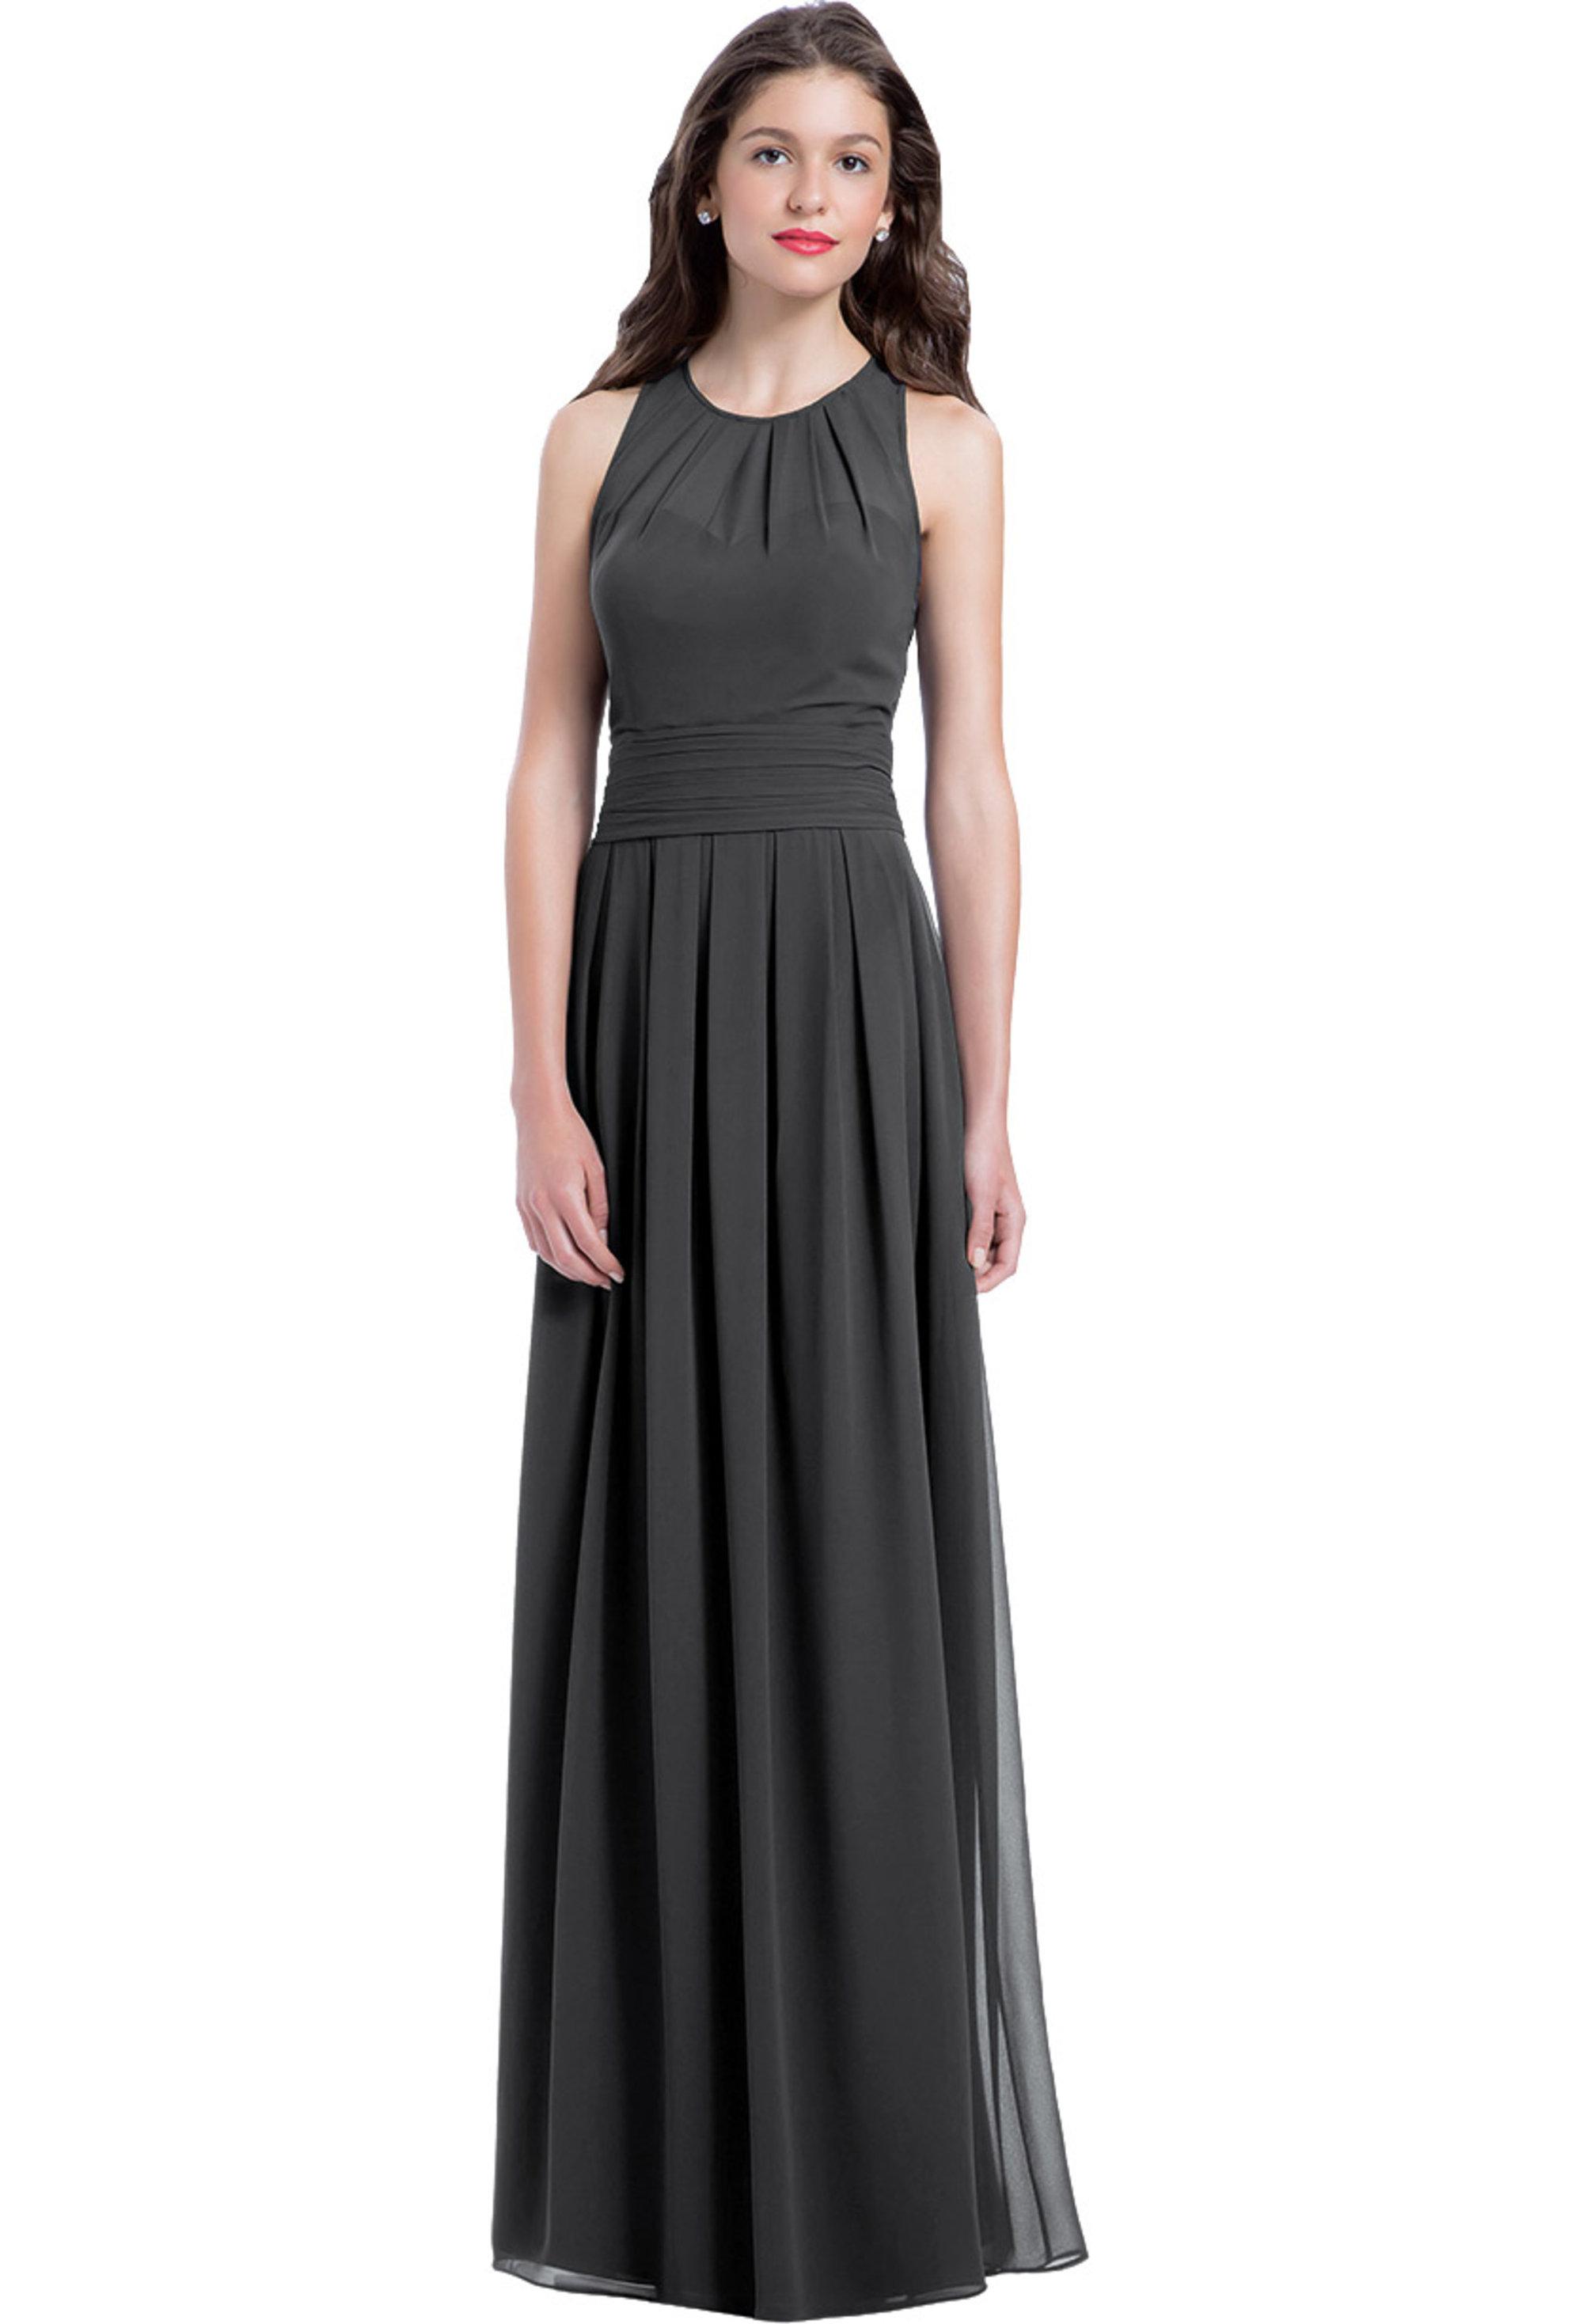 Bill Levkoff CHARCOAL Chiffon Jewel A-line gown, $220.00 Front